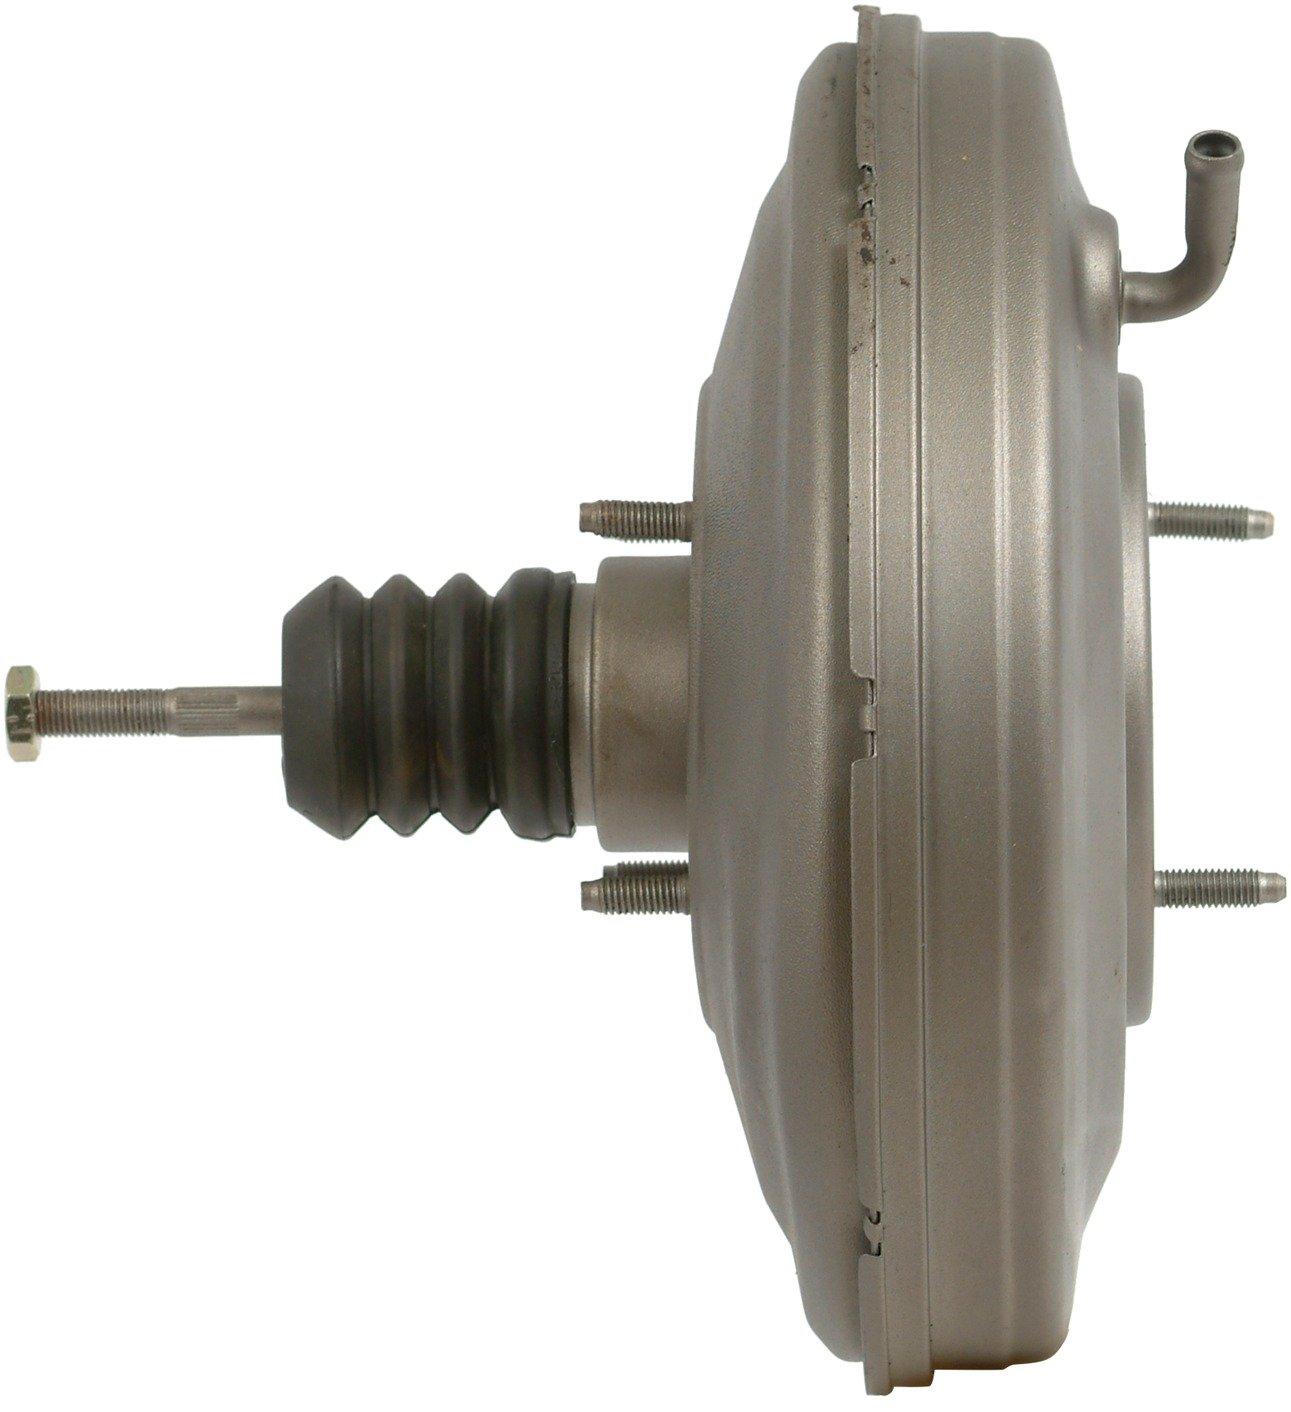 Cardone 53-8526 Remanufactured Import Power Brake Booster A1 Cardone